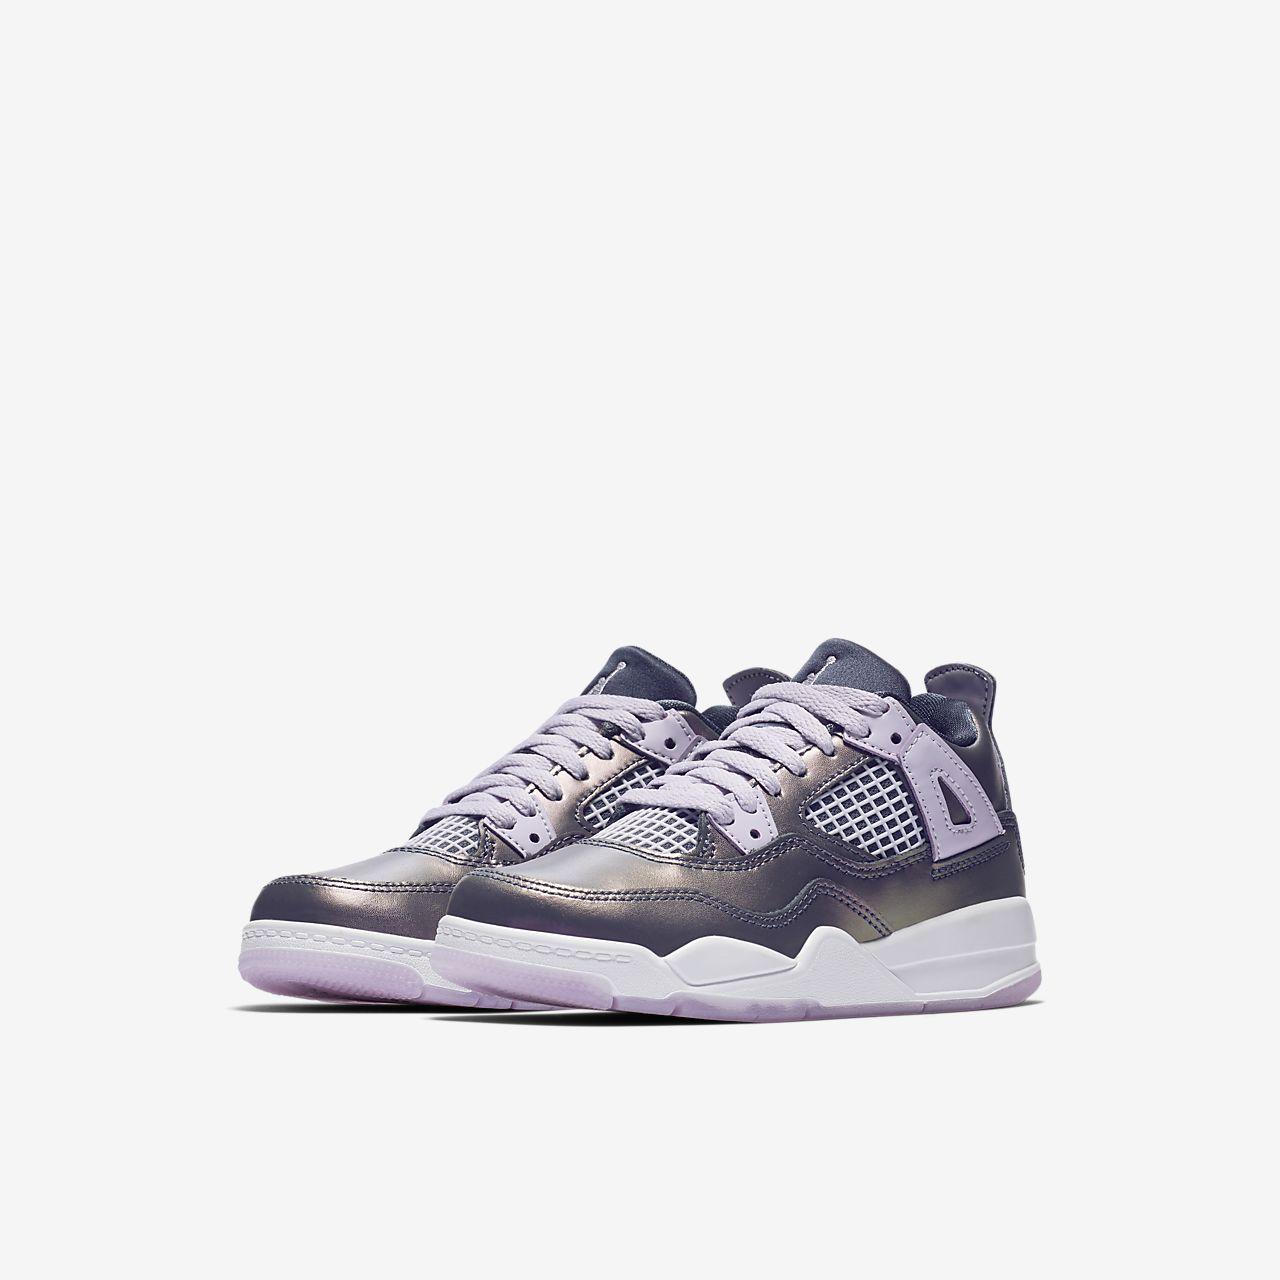 4063629eced4f Jordan 4 Retro SE Little Kids' Shoe. Nike.com